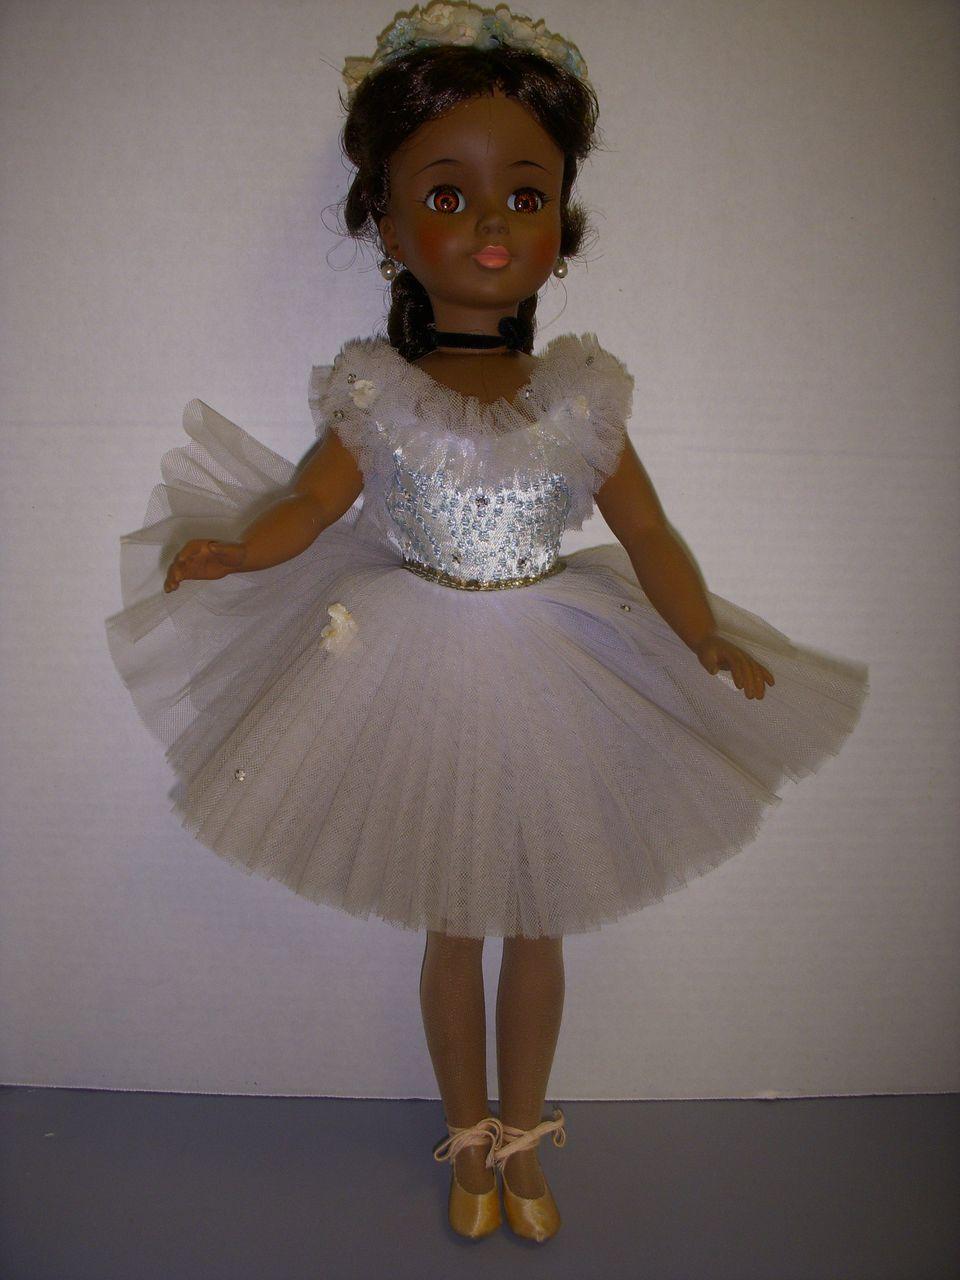 Vintage 1960s Madame Alexander Quot Leslie Quot Doll All Original